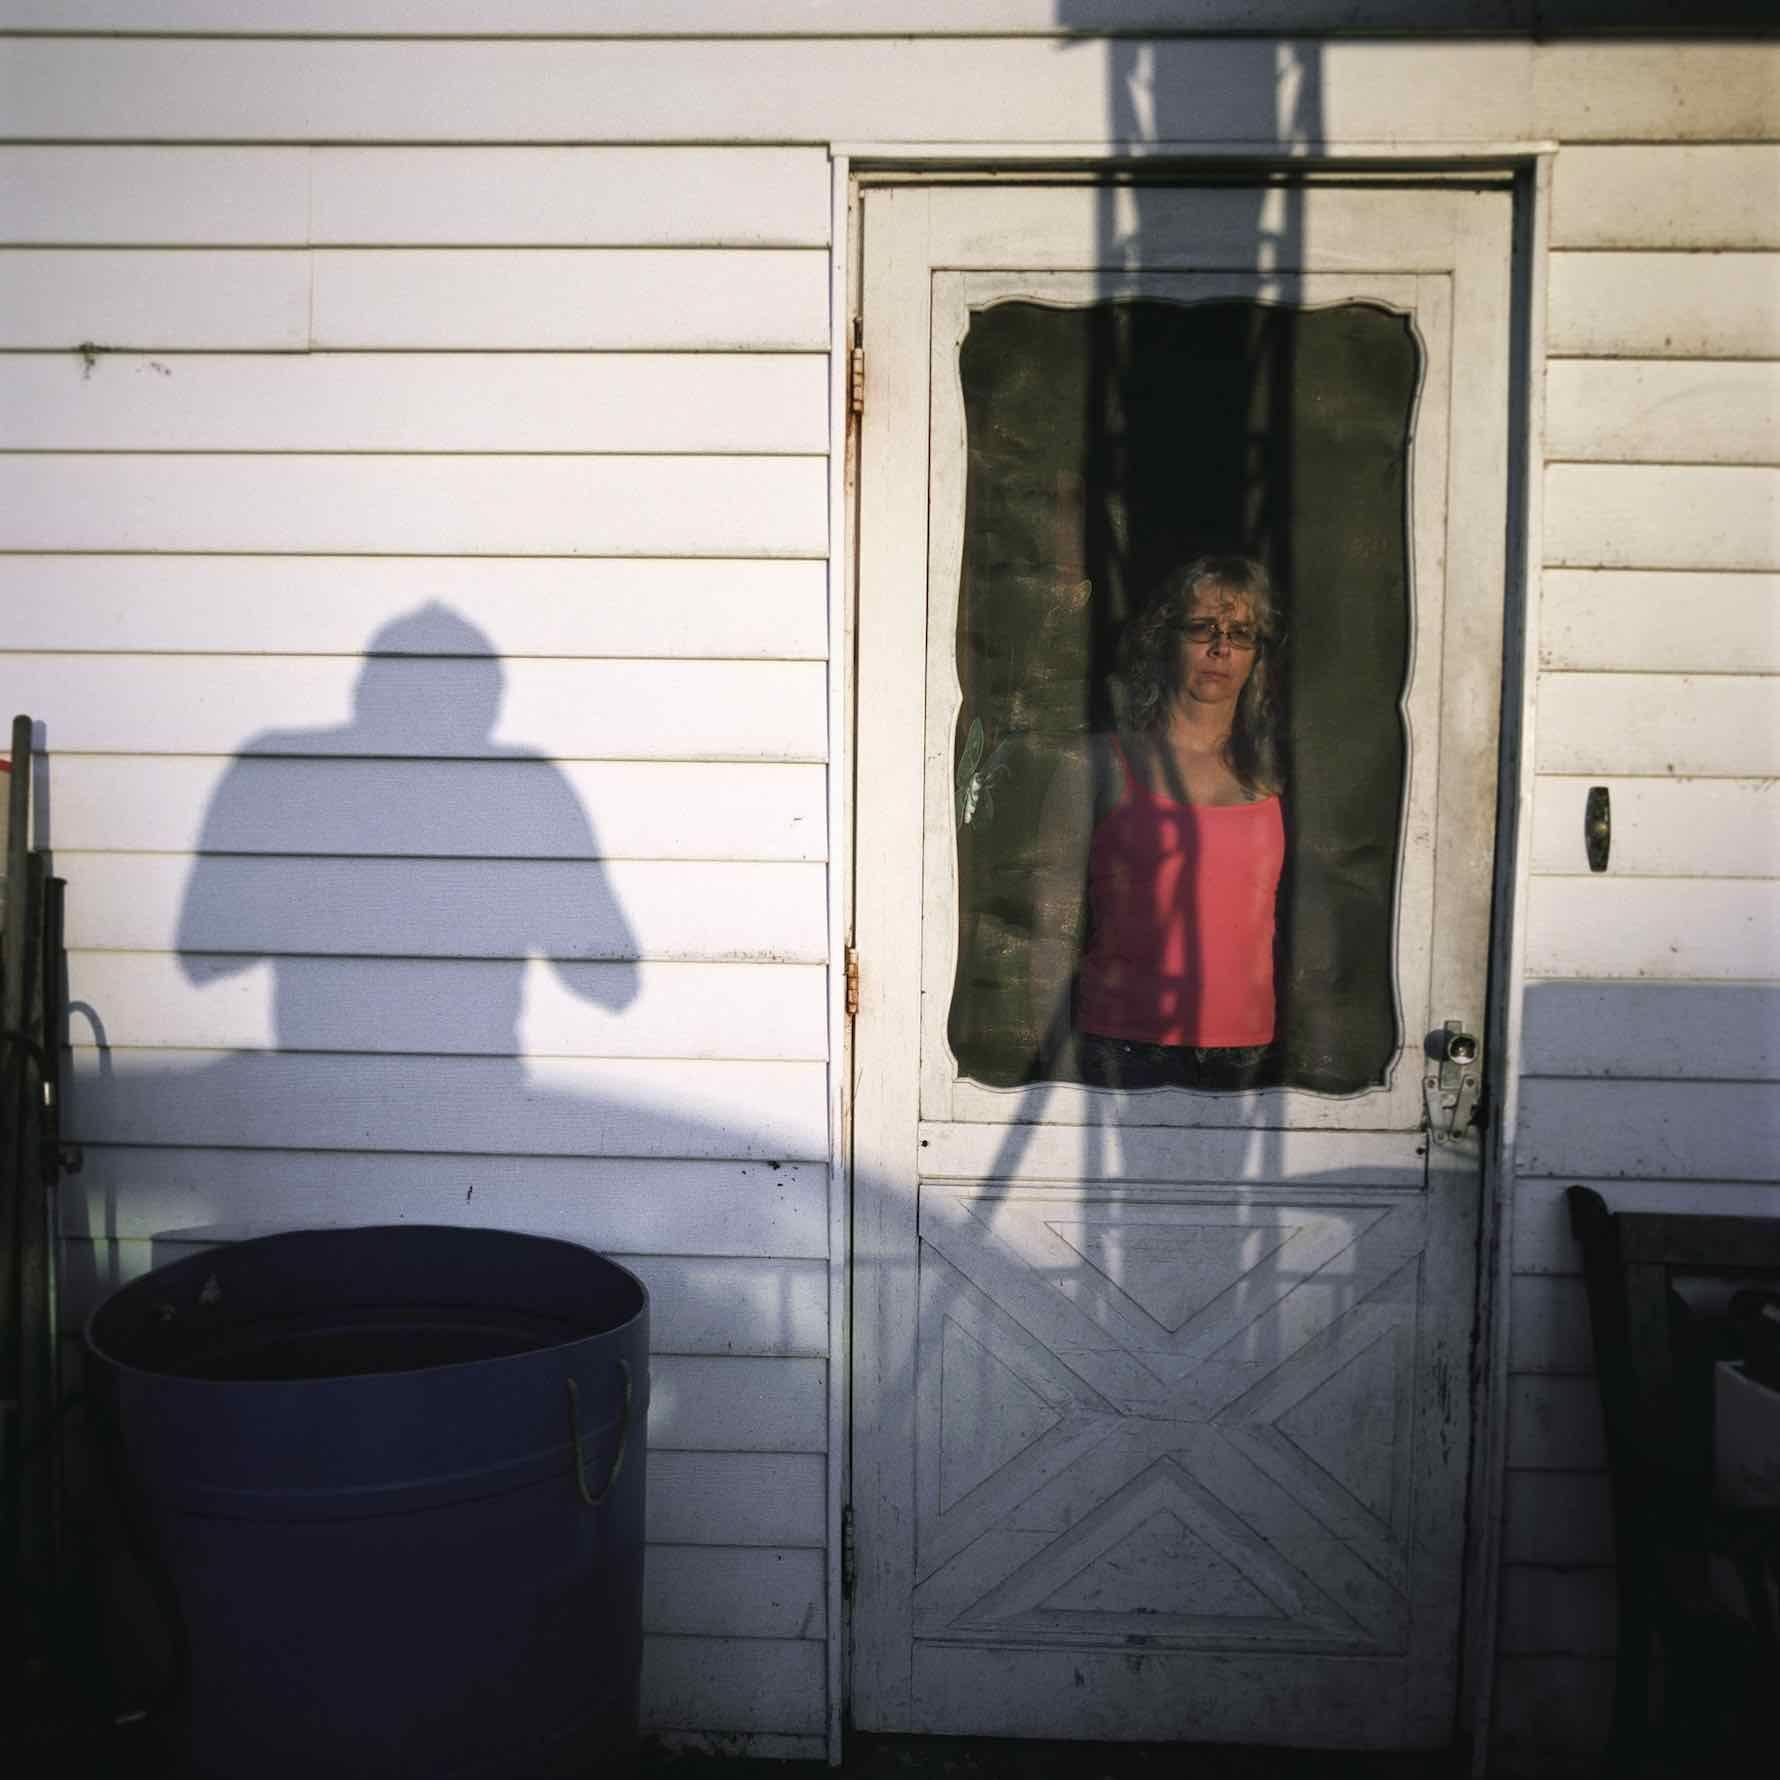 Mrs Bundy The Morning News